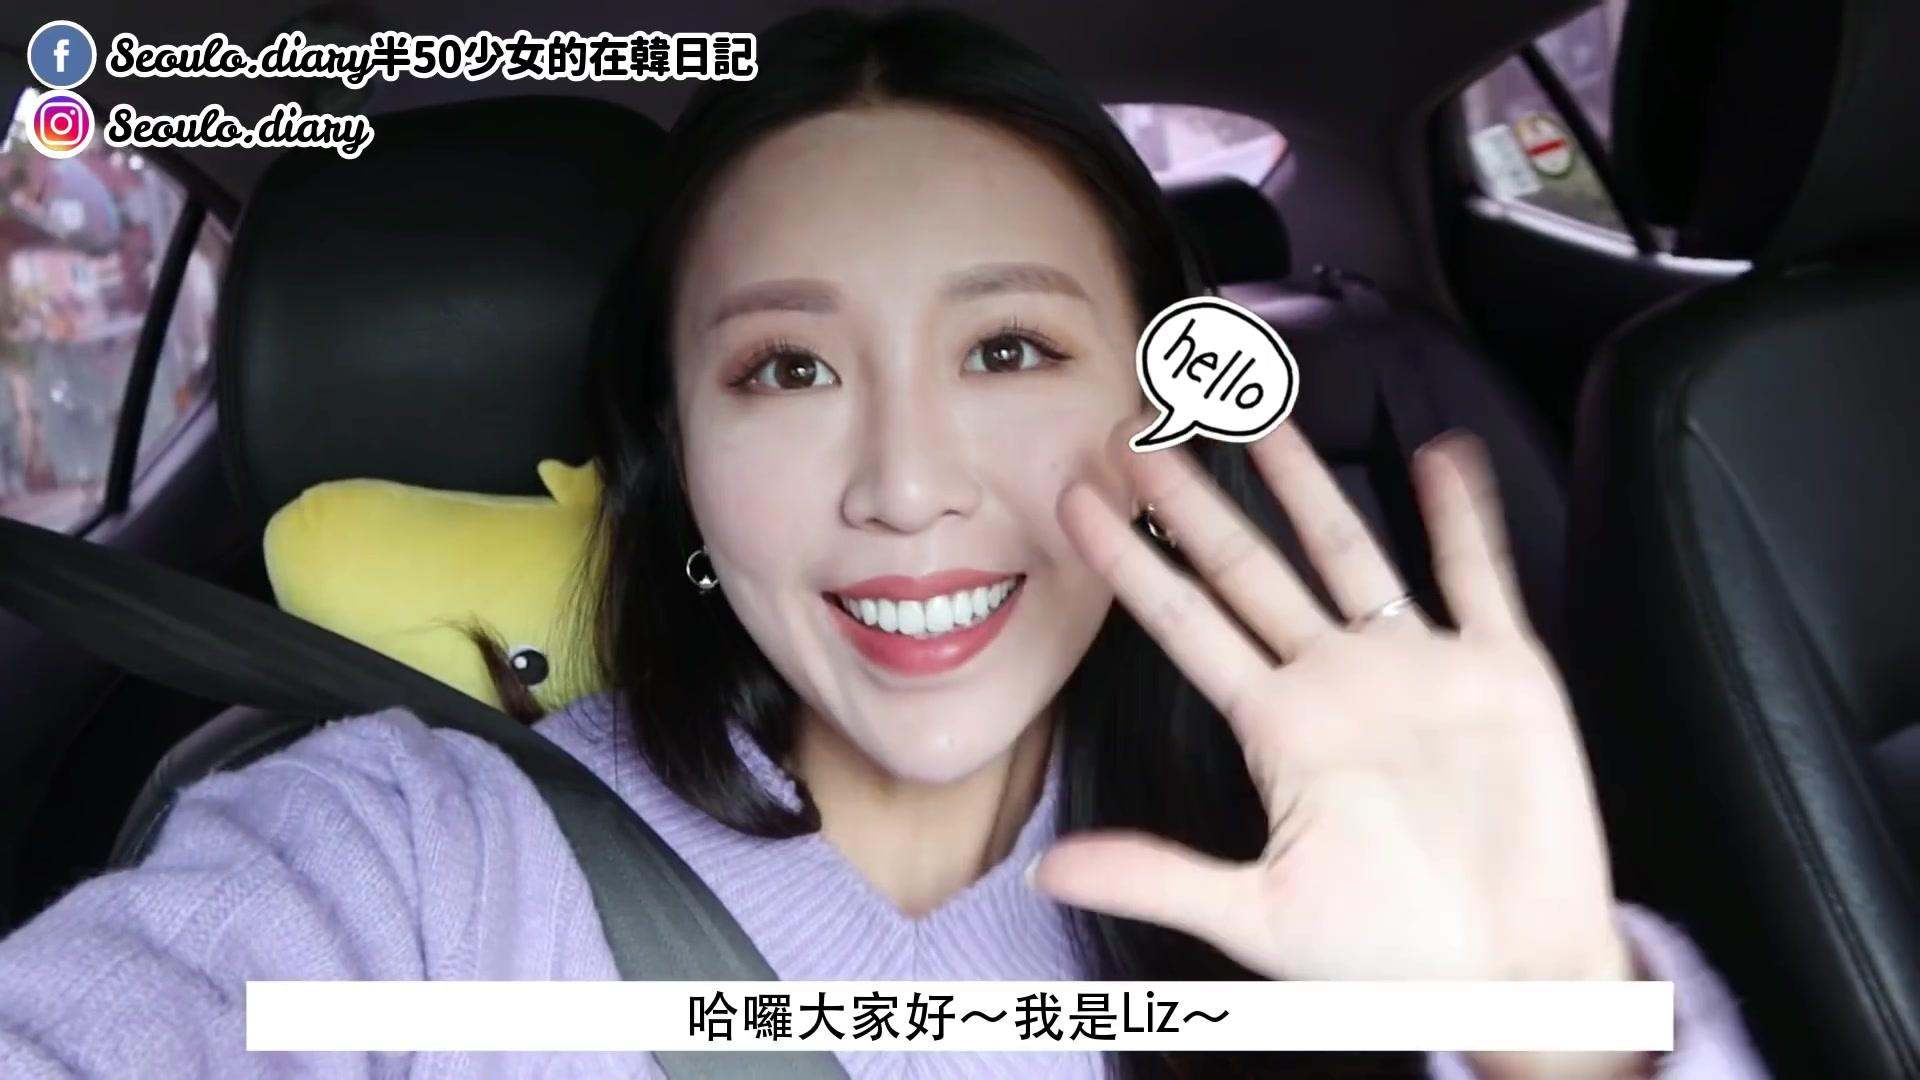 【Lizzy Daily】(韩国VLOG)一日贤妻之小巴西的幸福甜头日+ [韩国VLOG] 小巴西家族来韩国啦!!巴西人最爱的韩食